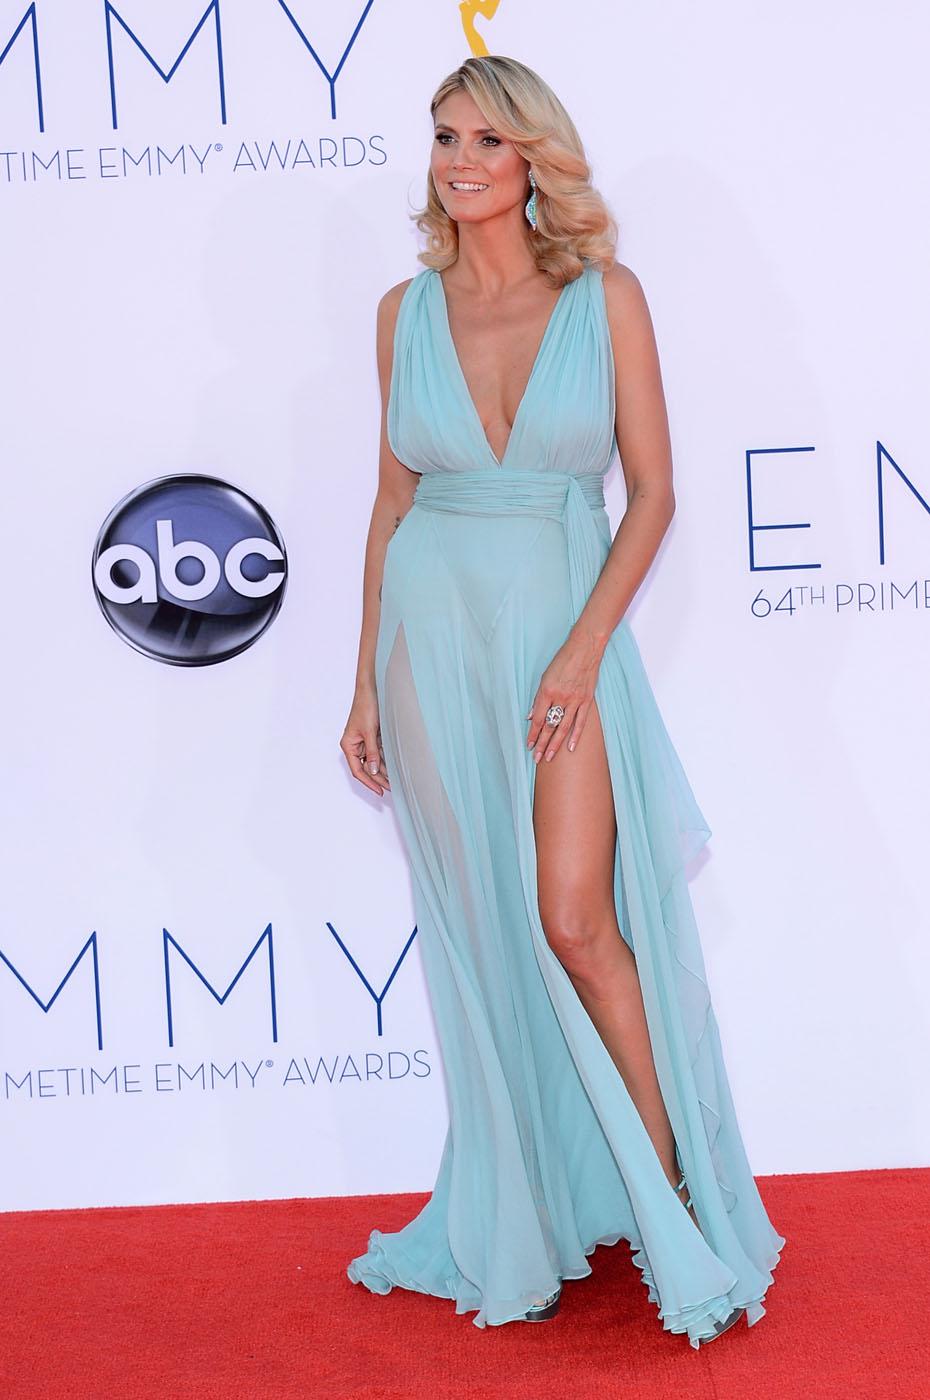 Heidi Klum - 2012 Emmy Awards, Red Carpet Looks